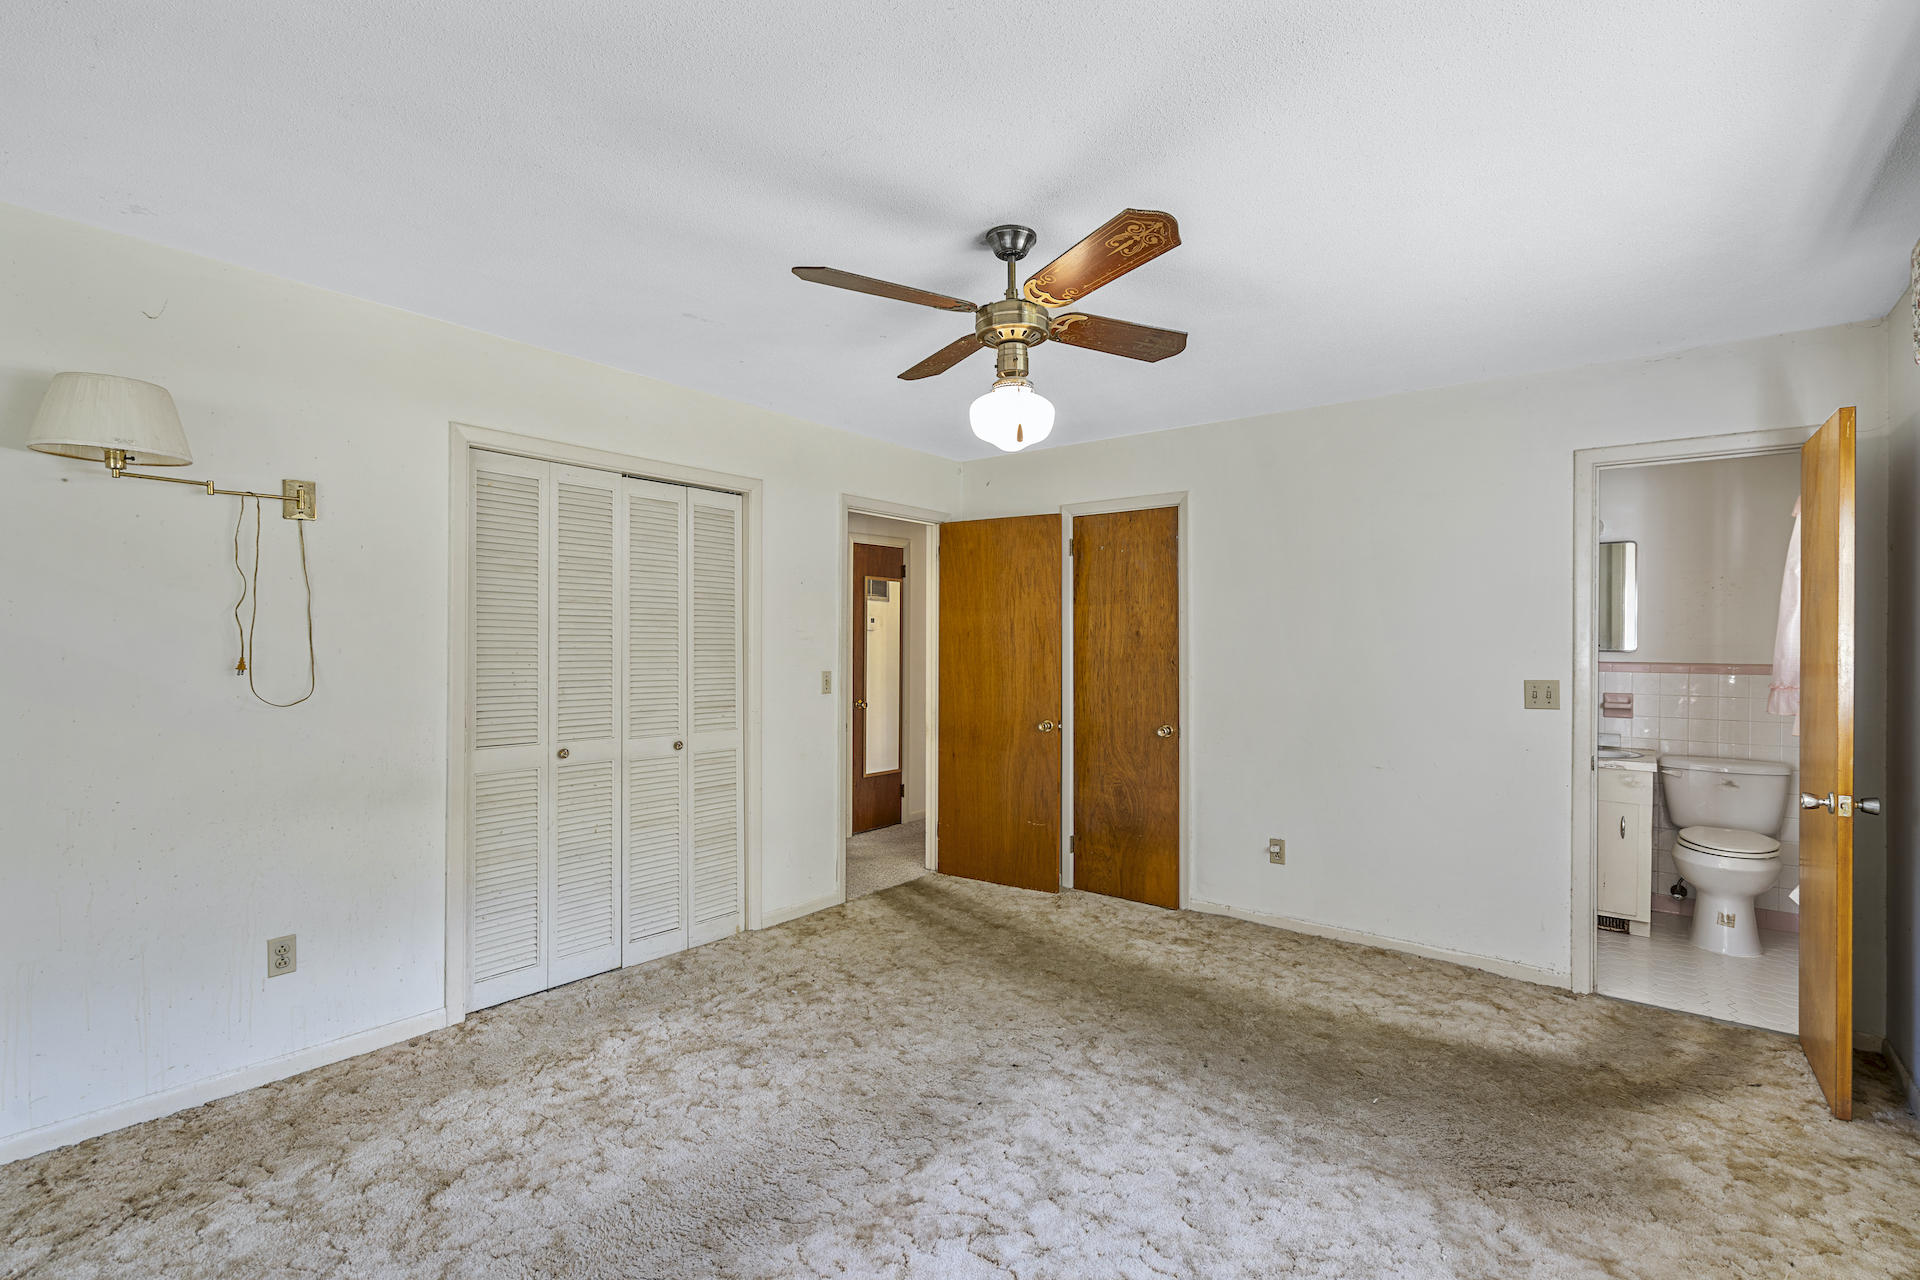 Charlestowne Estates I Homes For Sale - 1137 Culpepper, Charleston, SC - 17